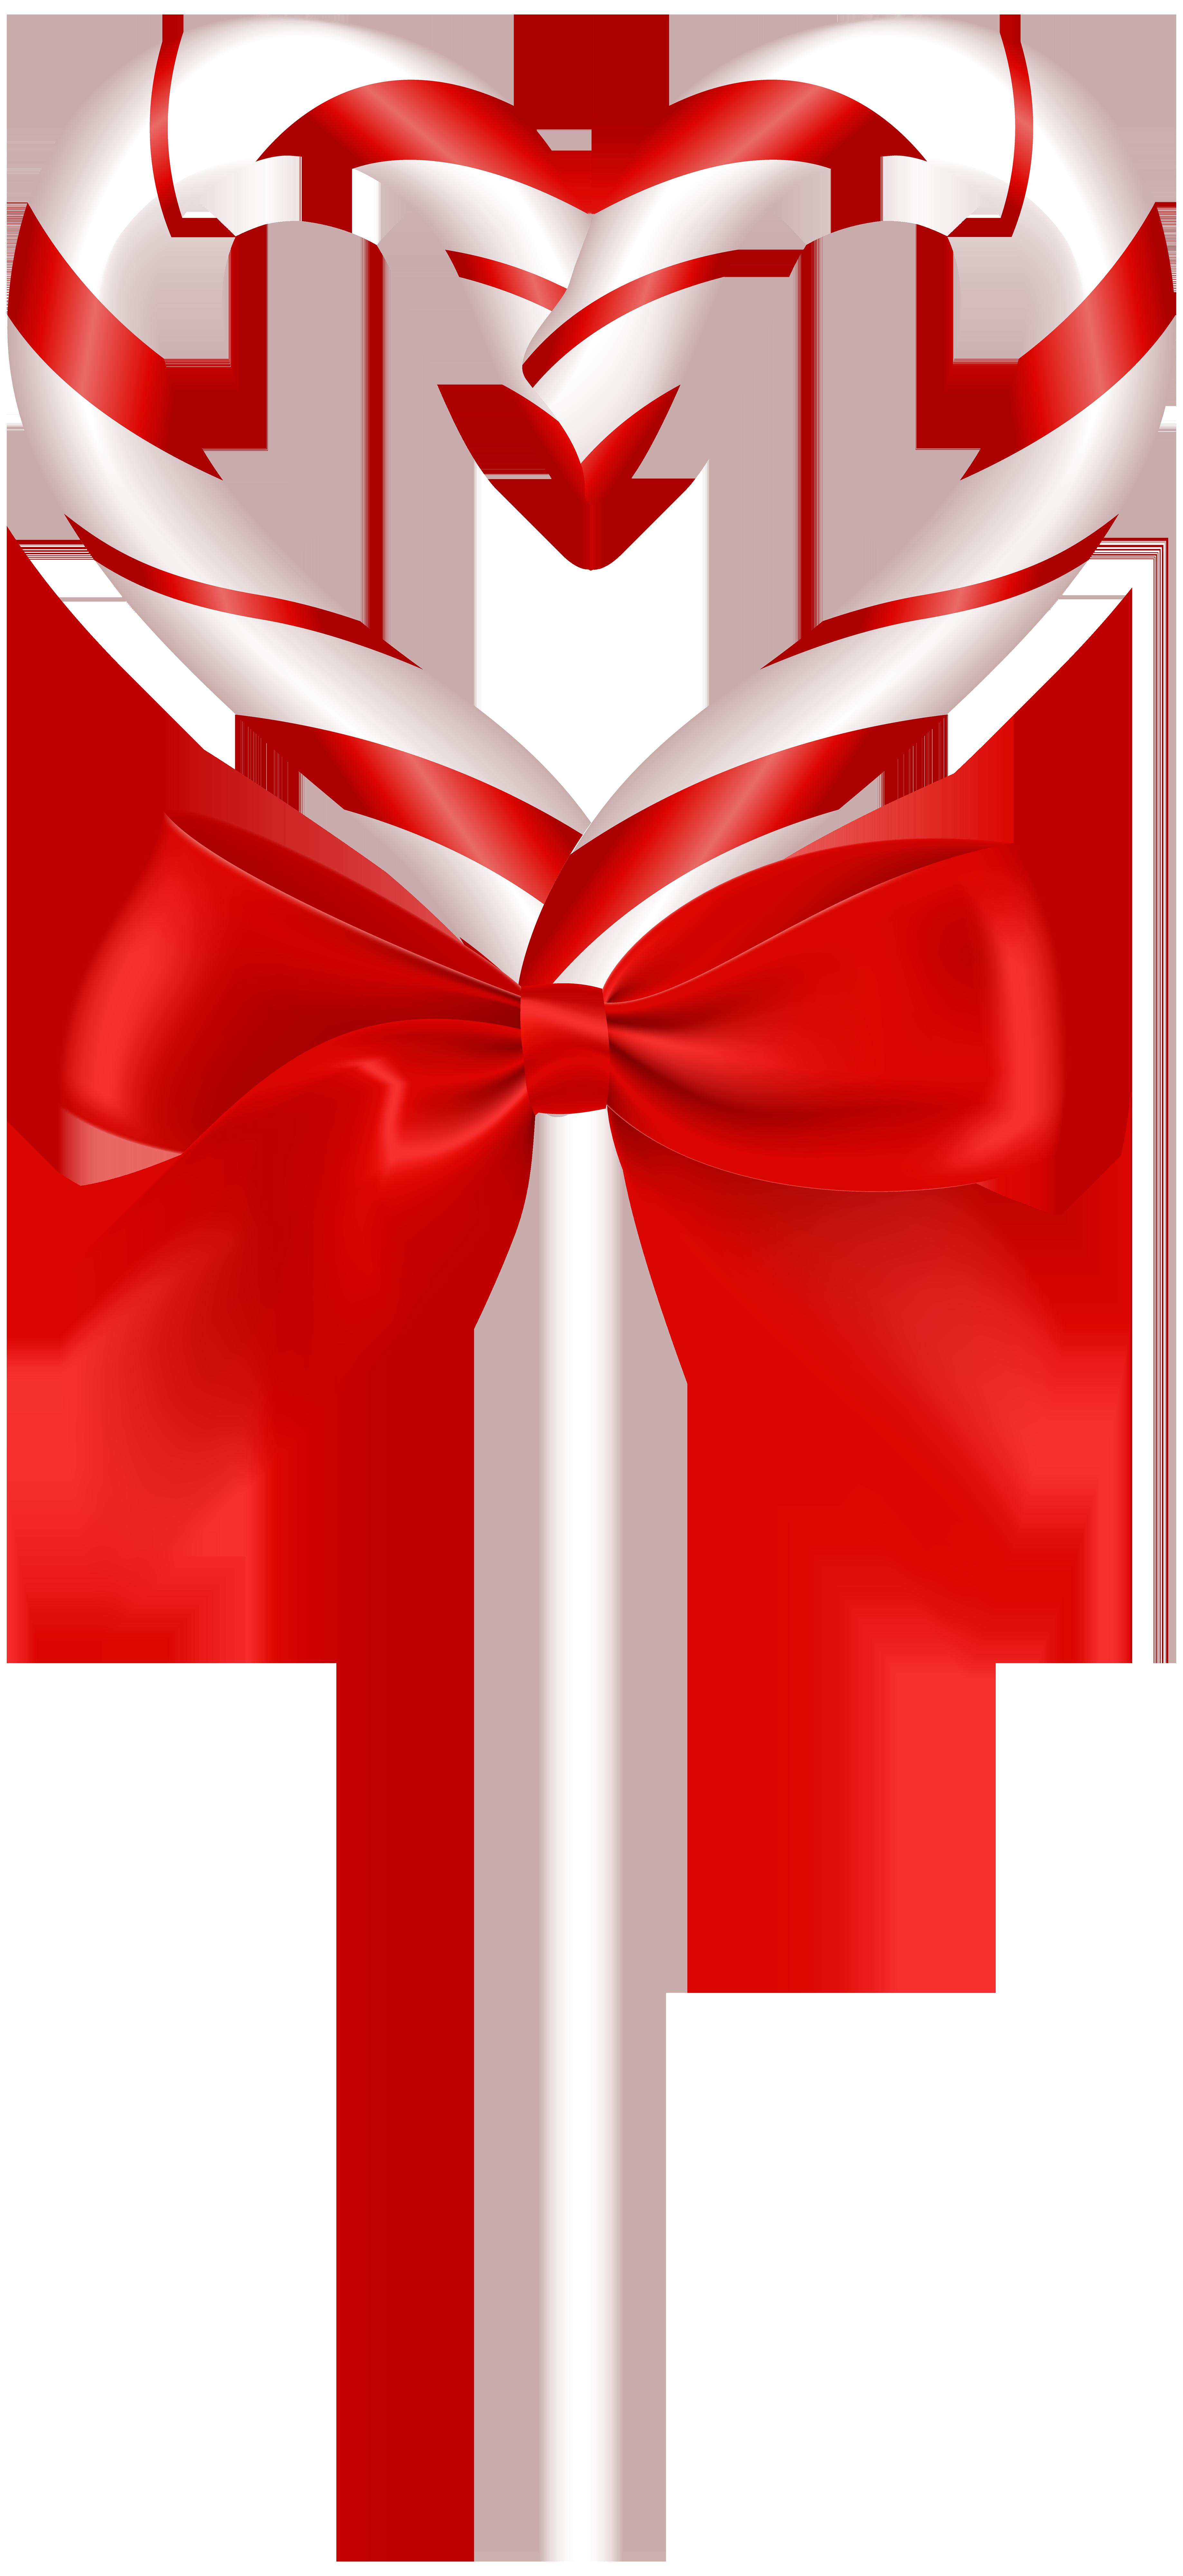 Tie clipart valentine Clip Gallery Heart Deco Yopriceville